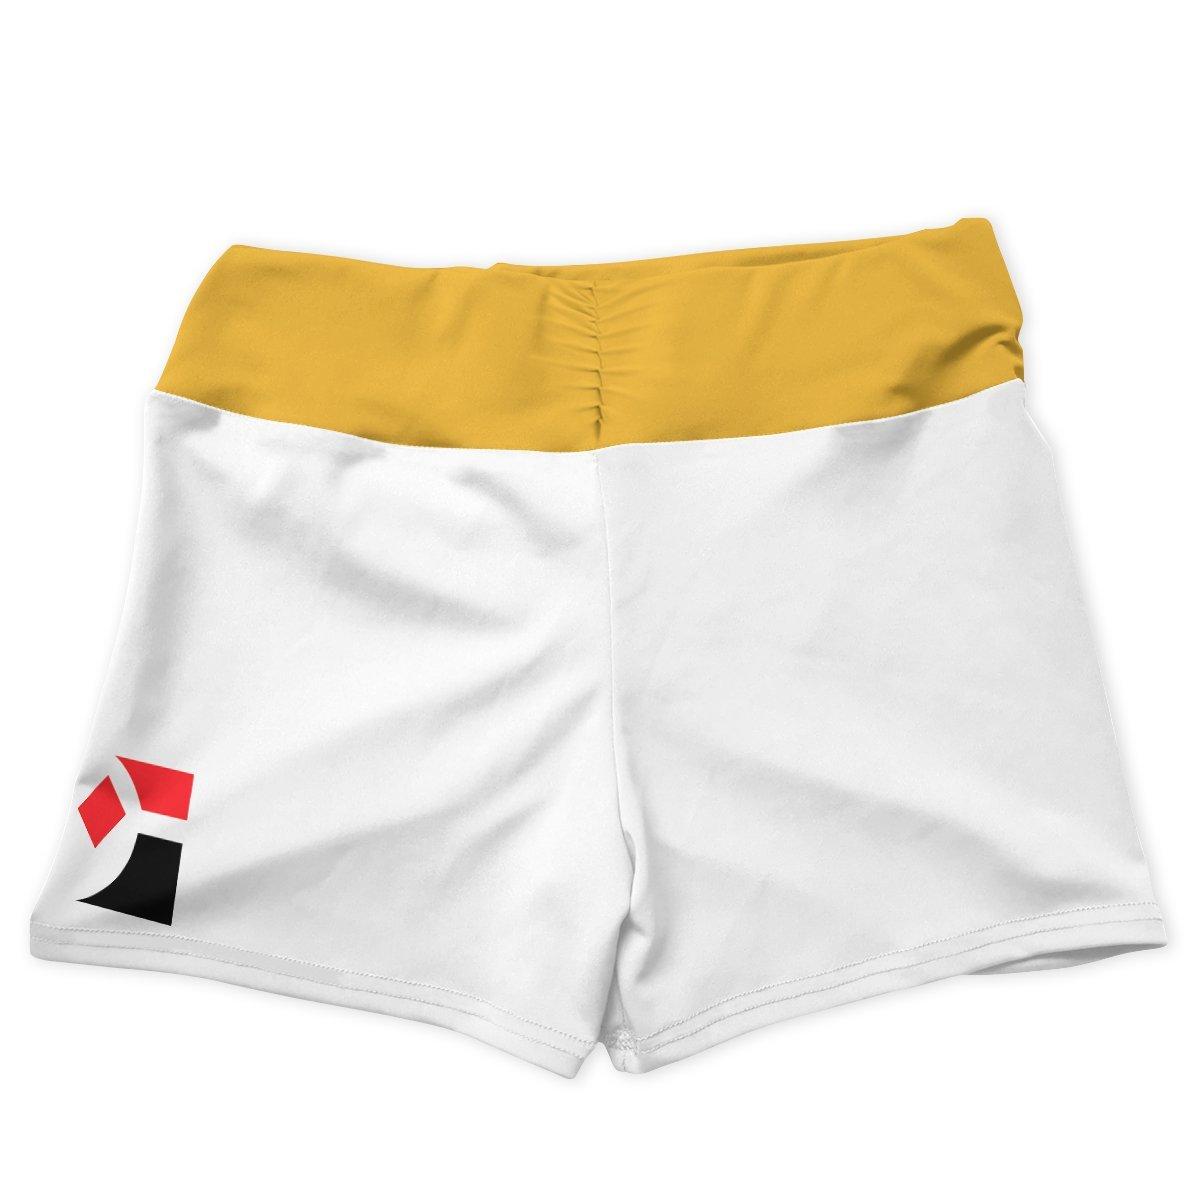 pokemon champion uniform active wear set 298587 - Anime Swimsuits